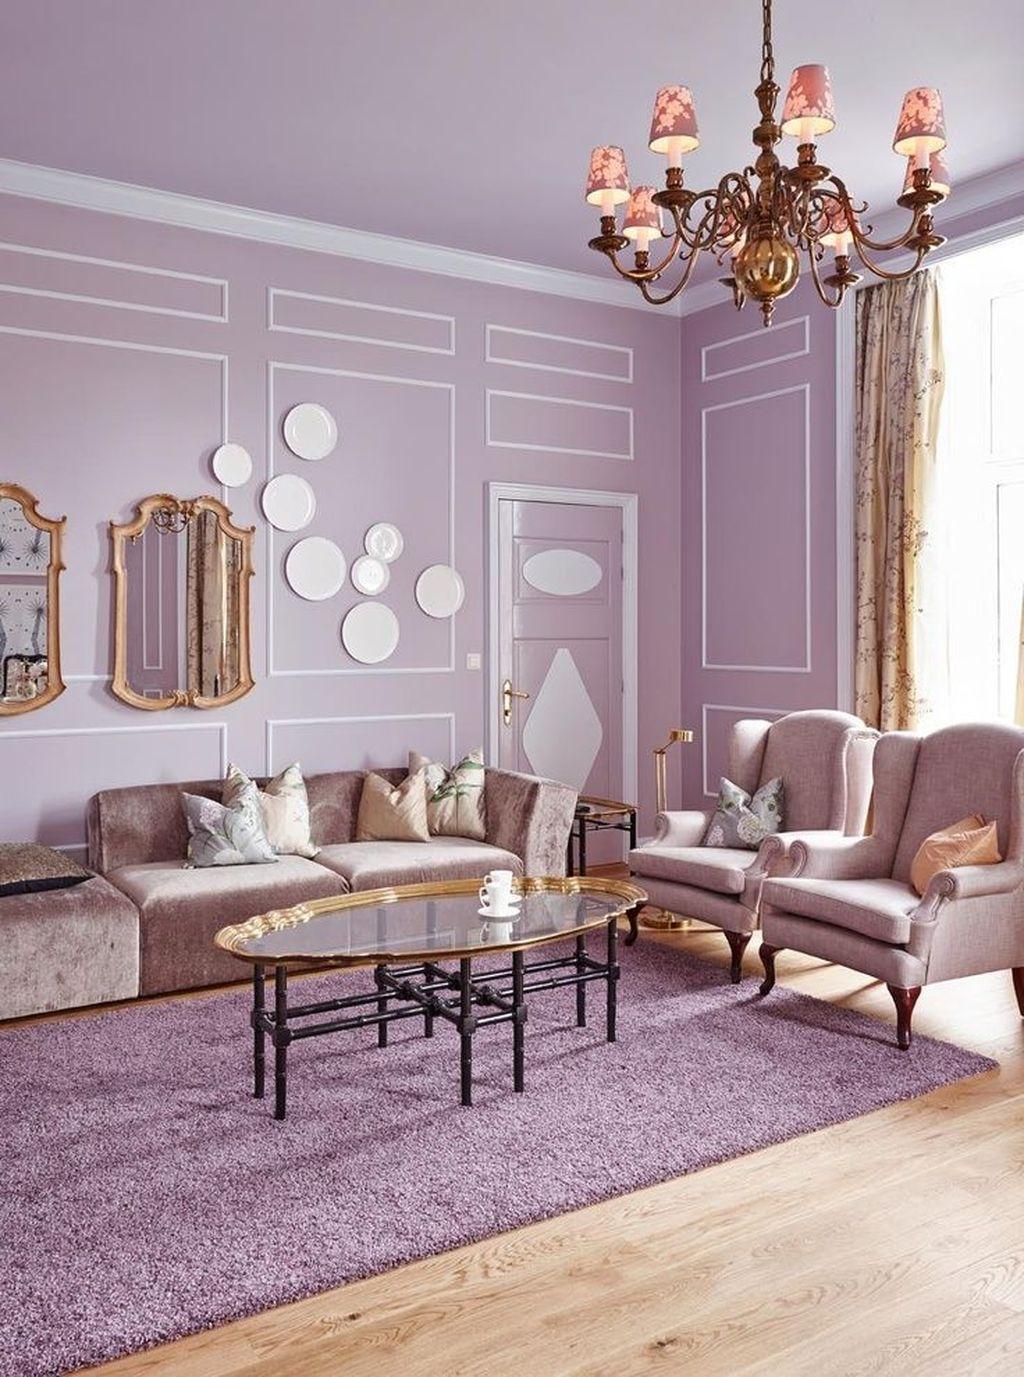 cozy interior room design ideas with purple walls 21 on interior wall colors ideas id=98317